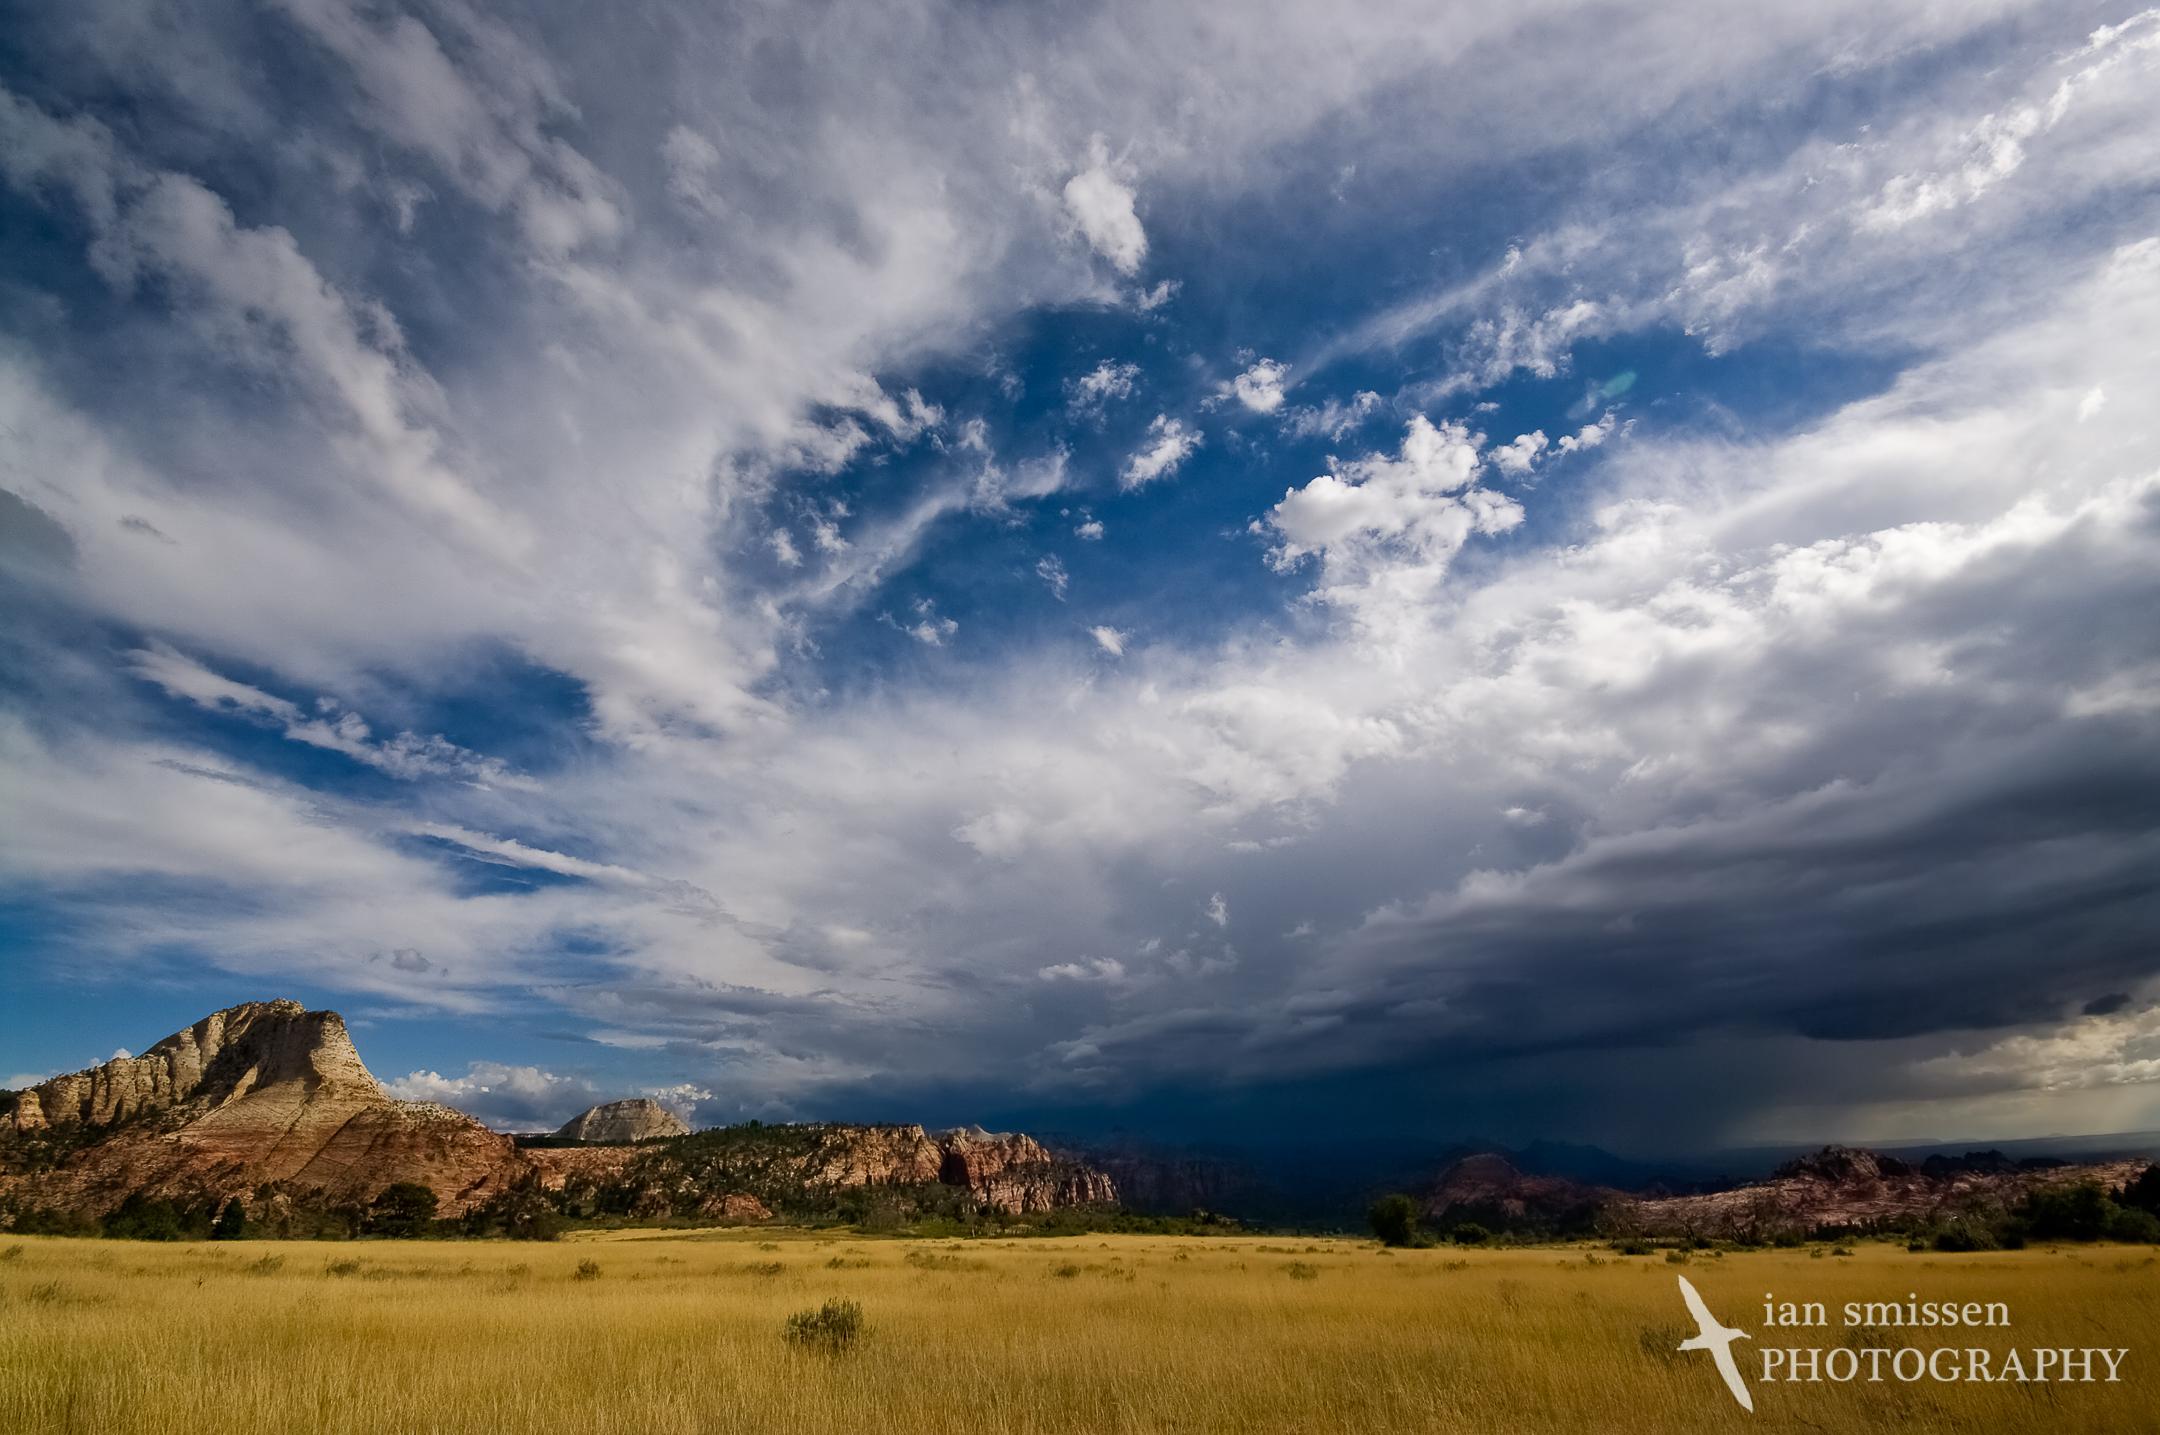 Storm over Zion